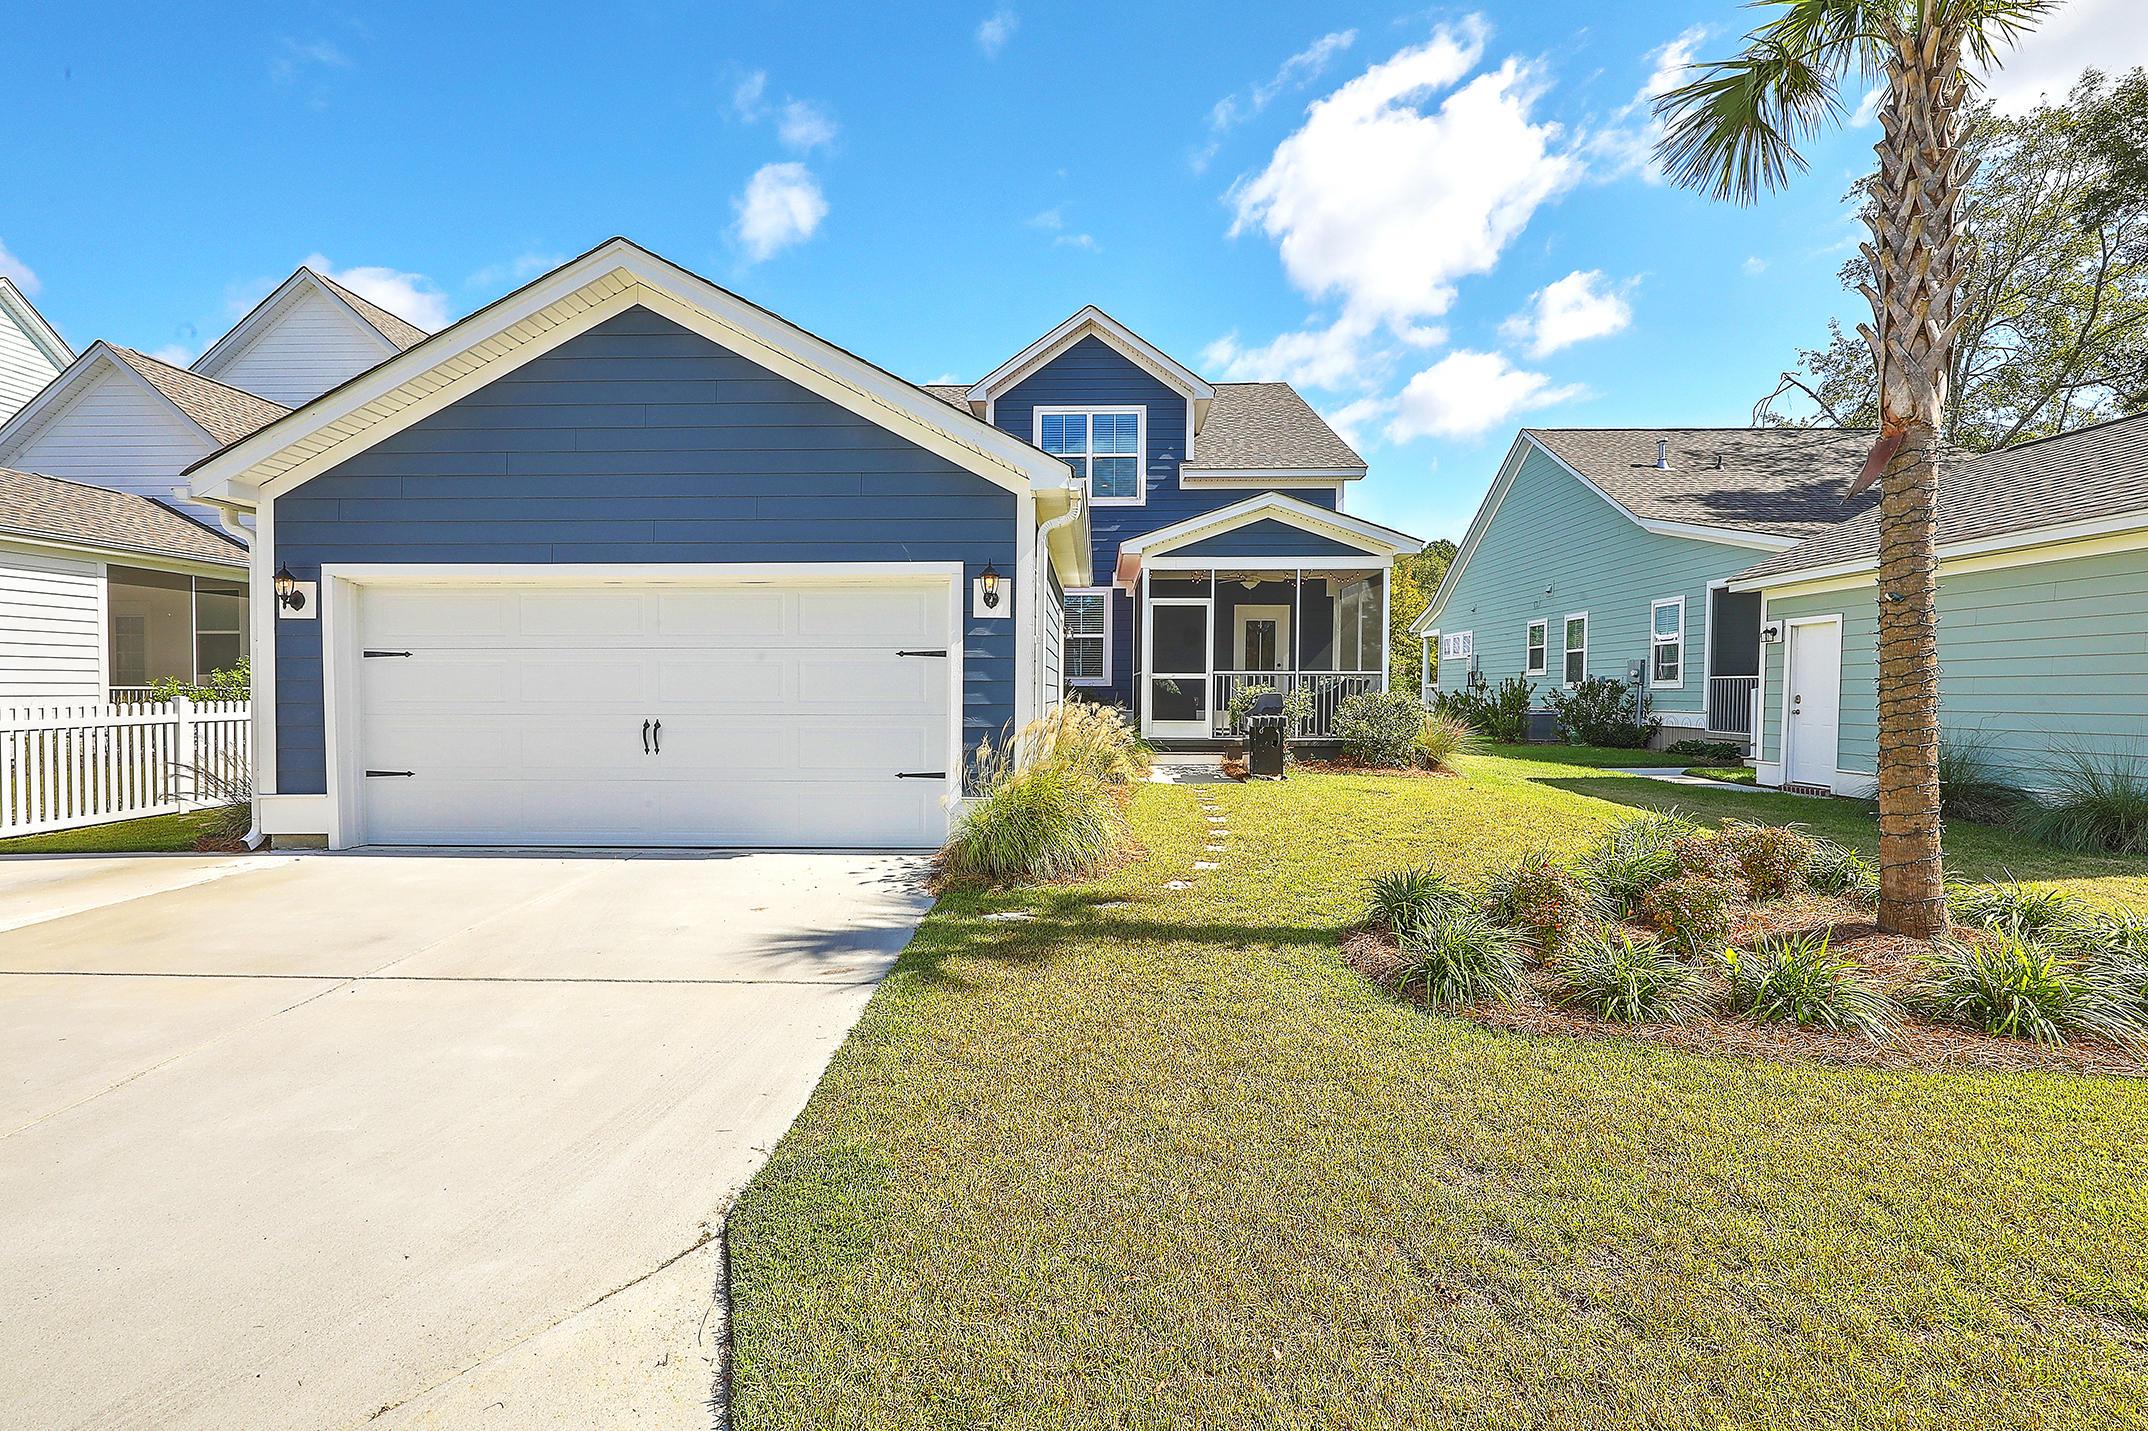 Park West Homes For Sale - 3412 Salterbeck, Mount Pleasant, SC - 30